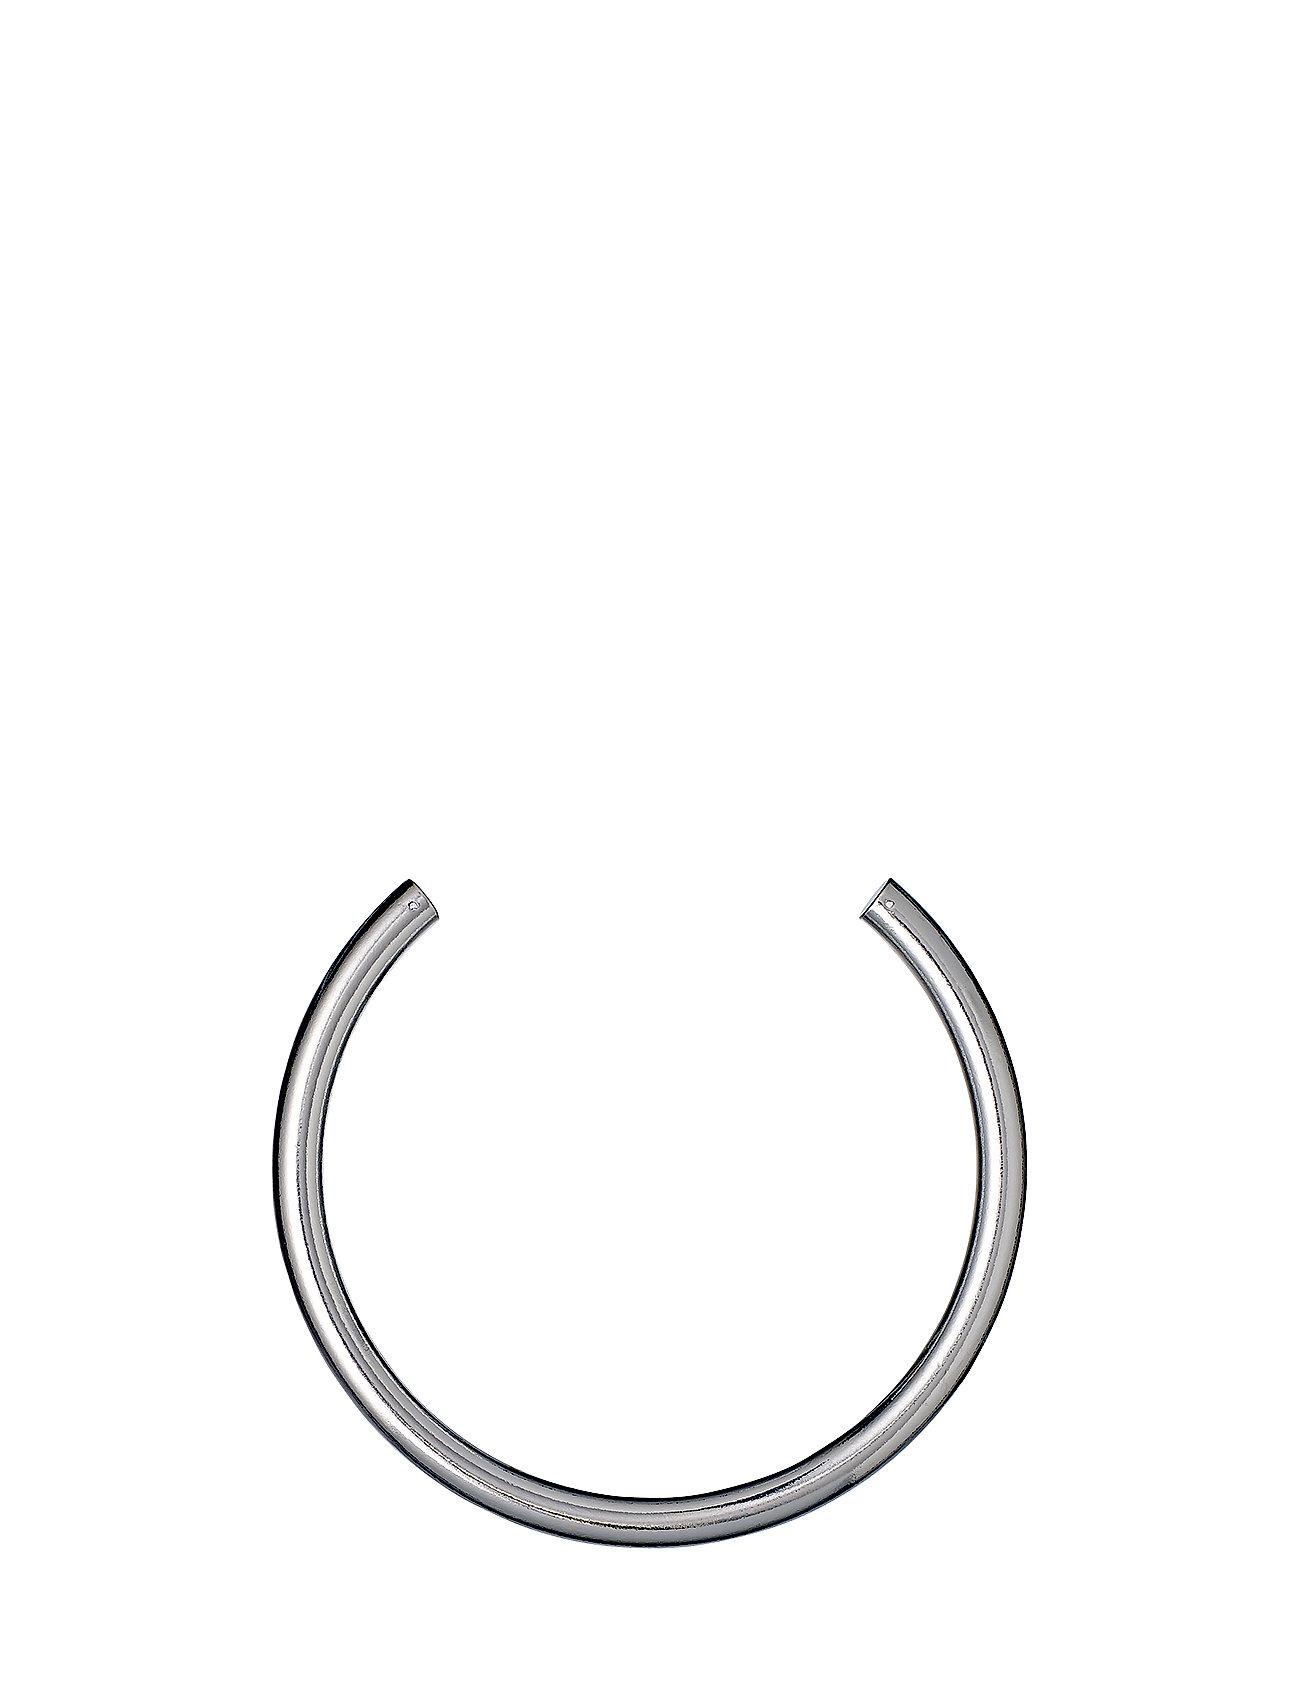 Dolag Necklace